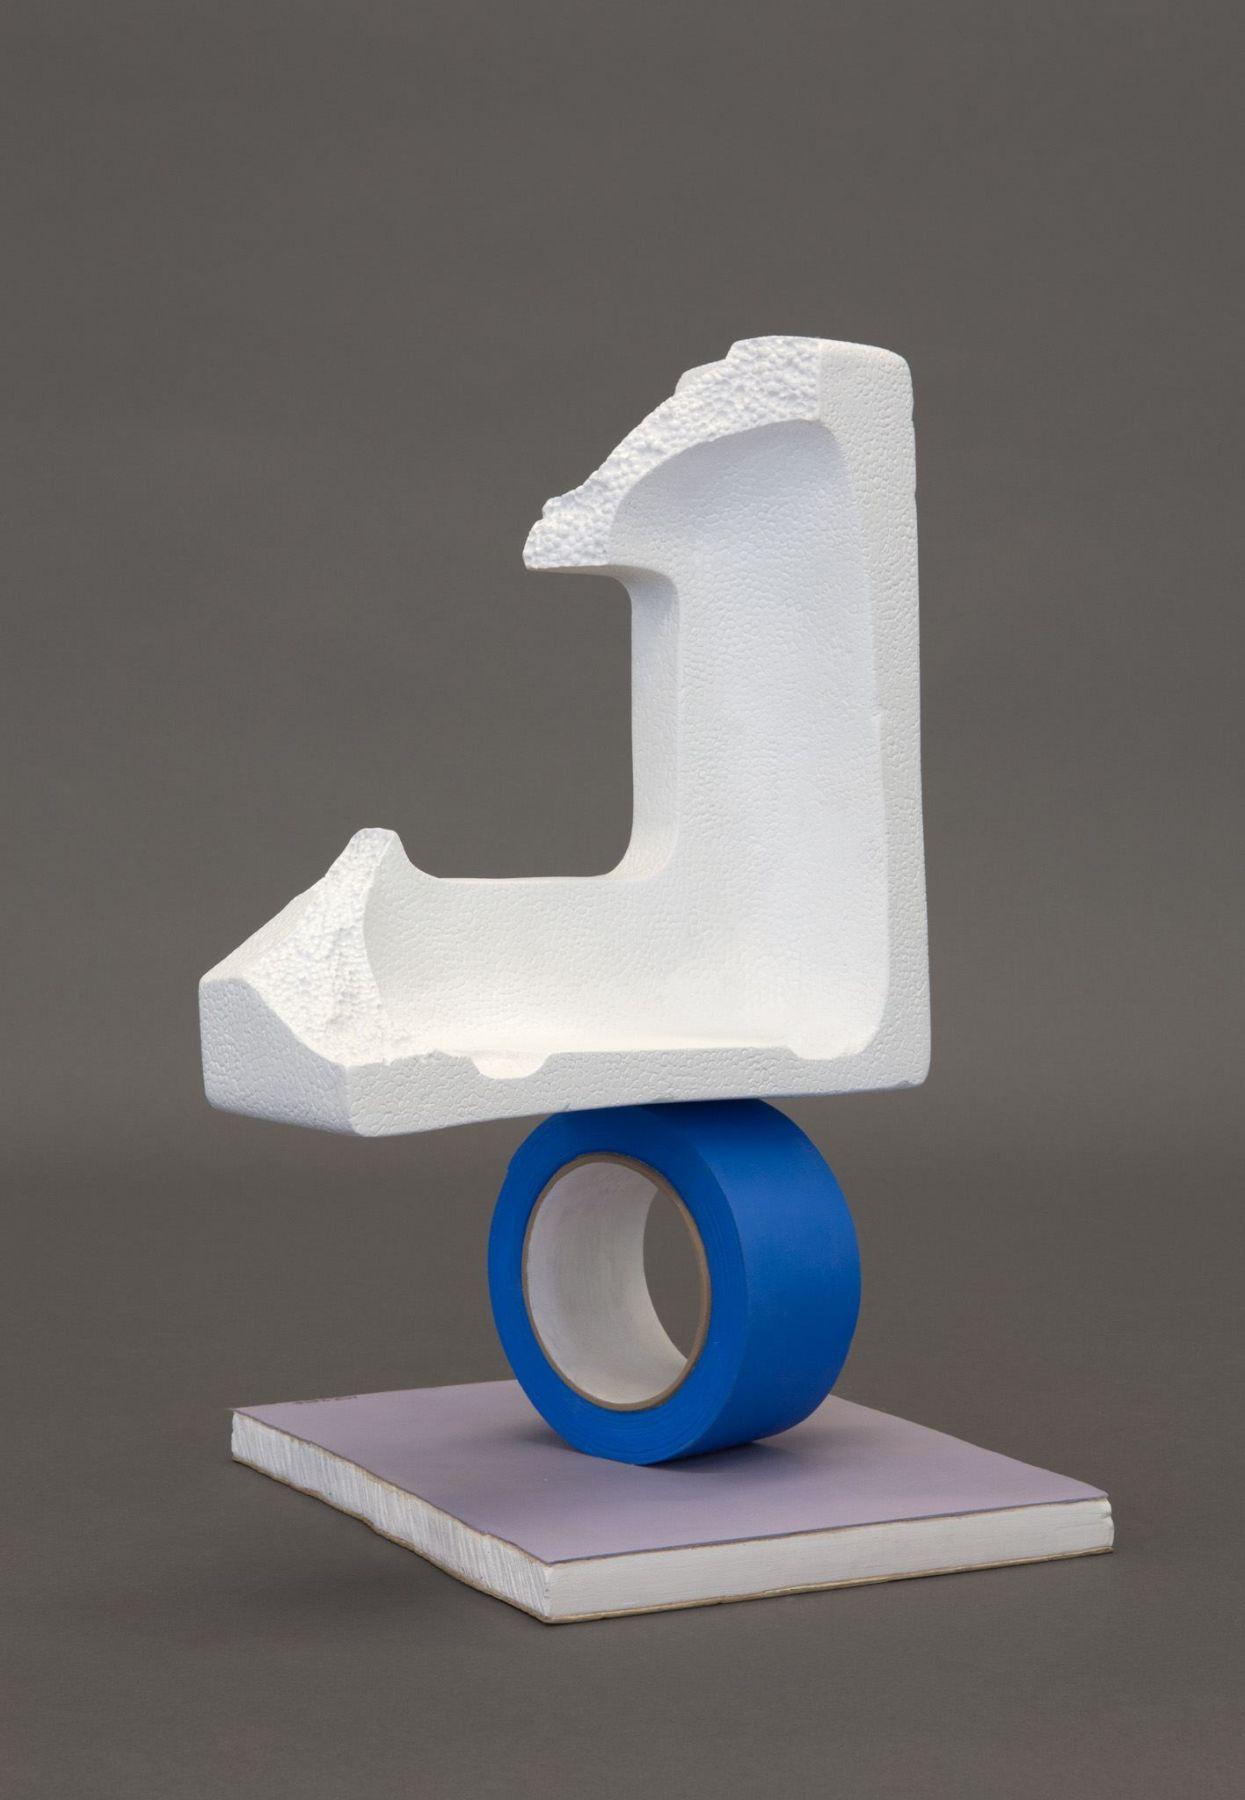 Matt Johnson, Untitled (Balancing Styrofoam Corner on a Tape Roll), 2016